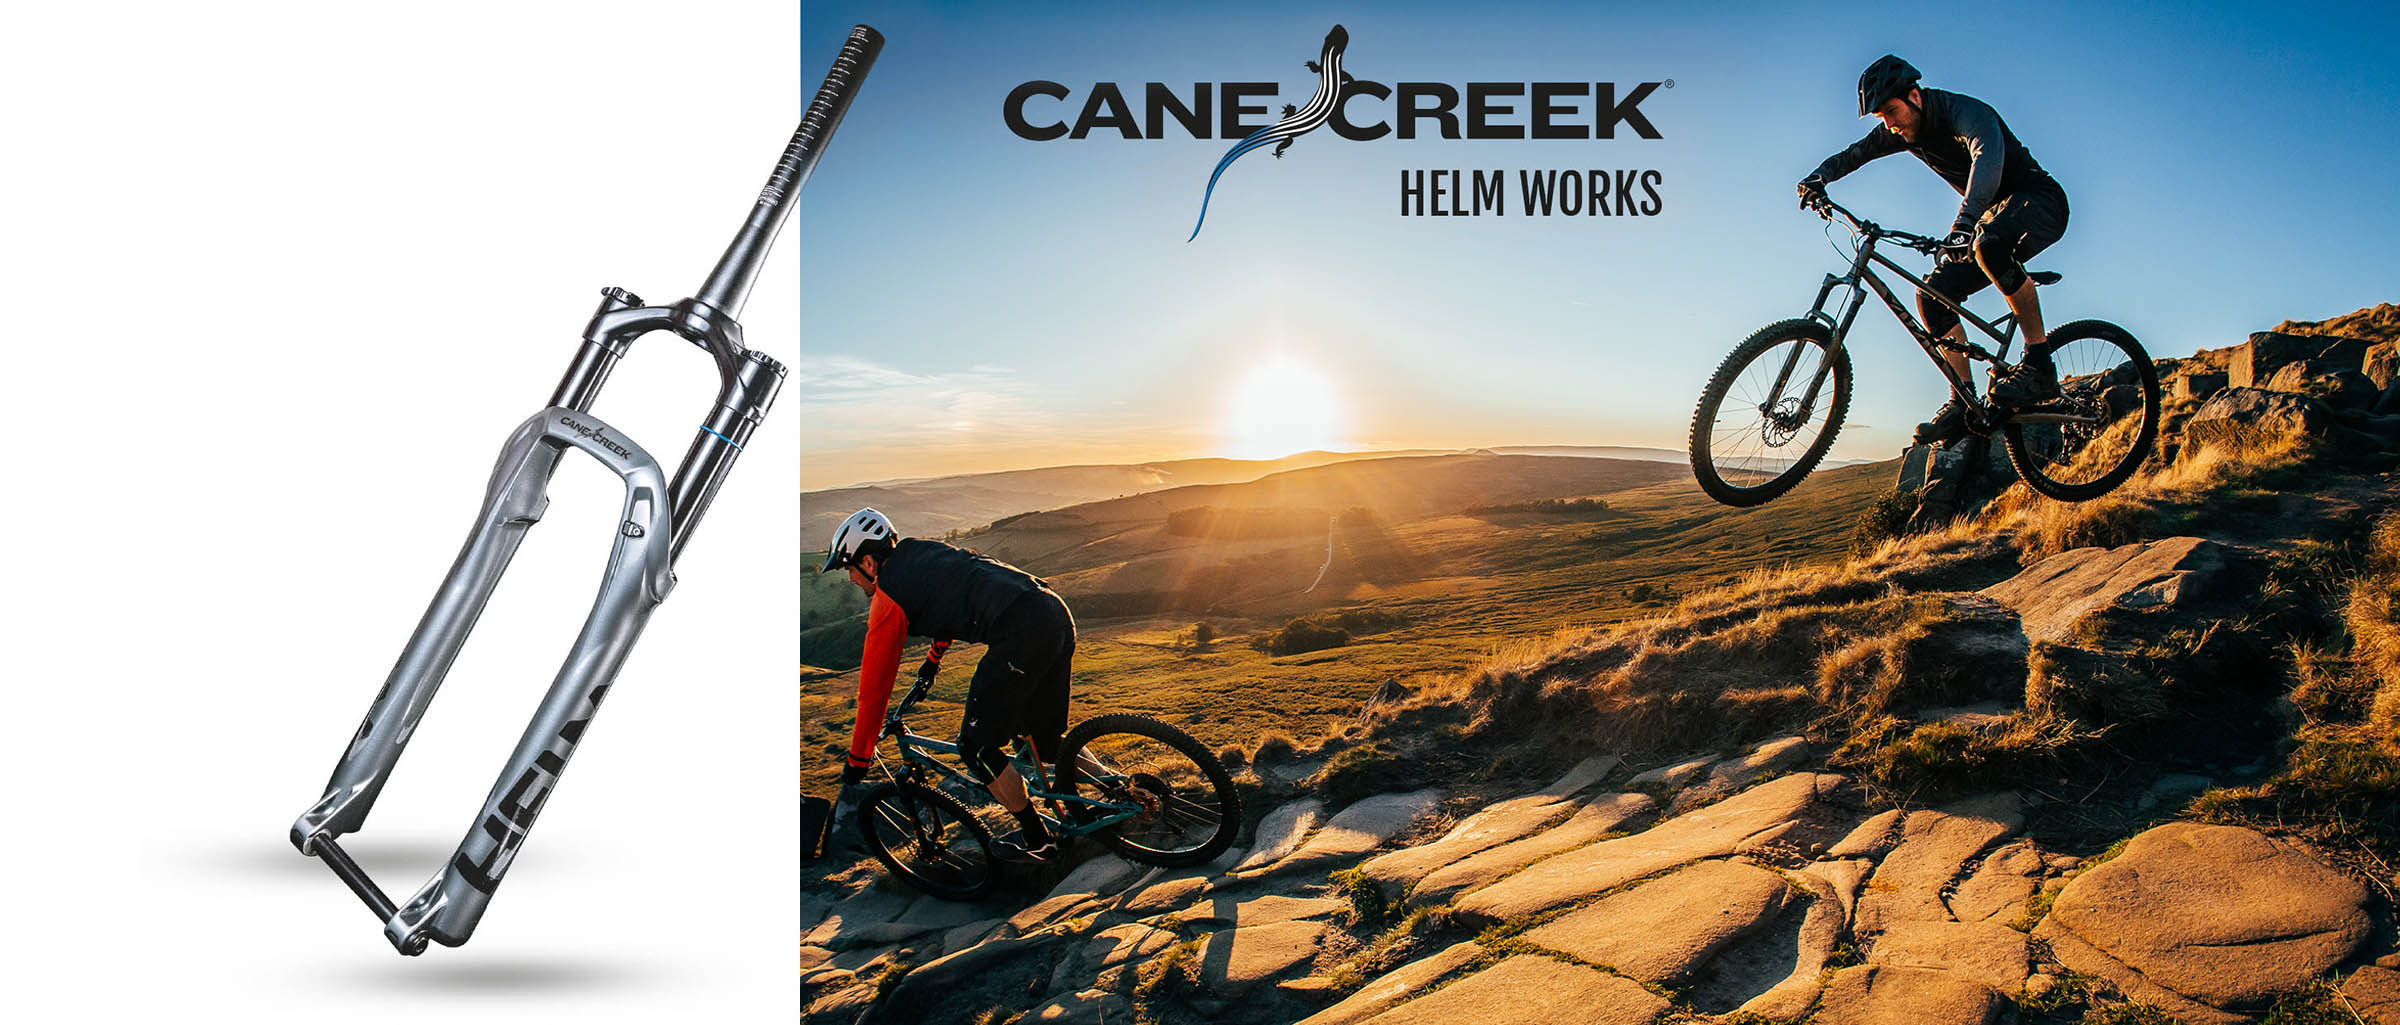 Cane Creek Helm